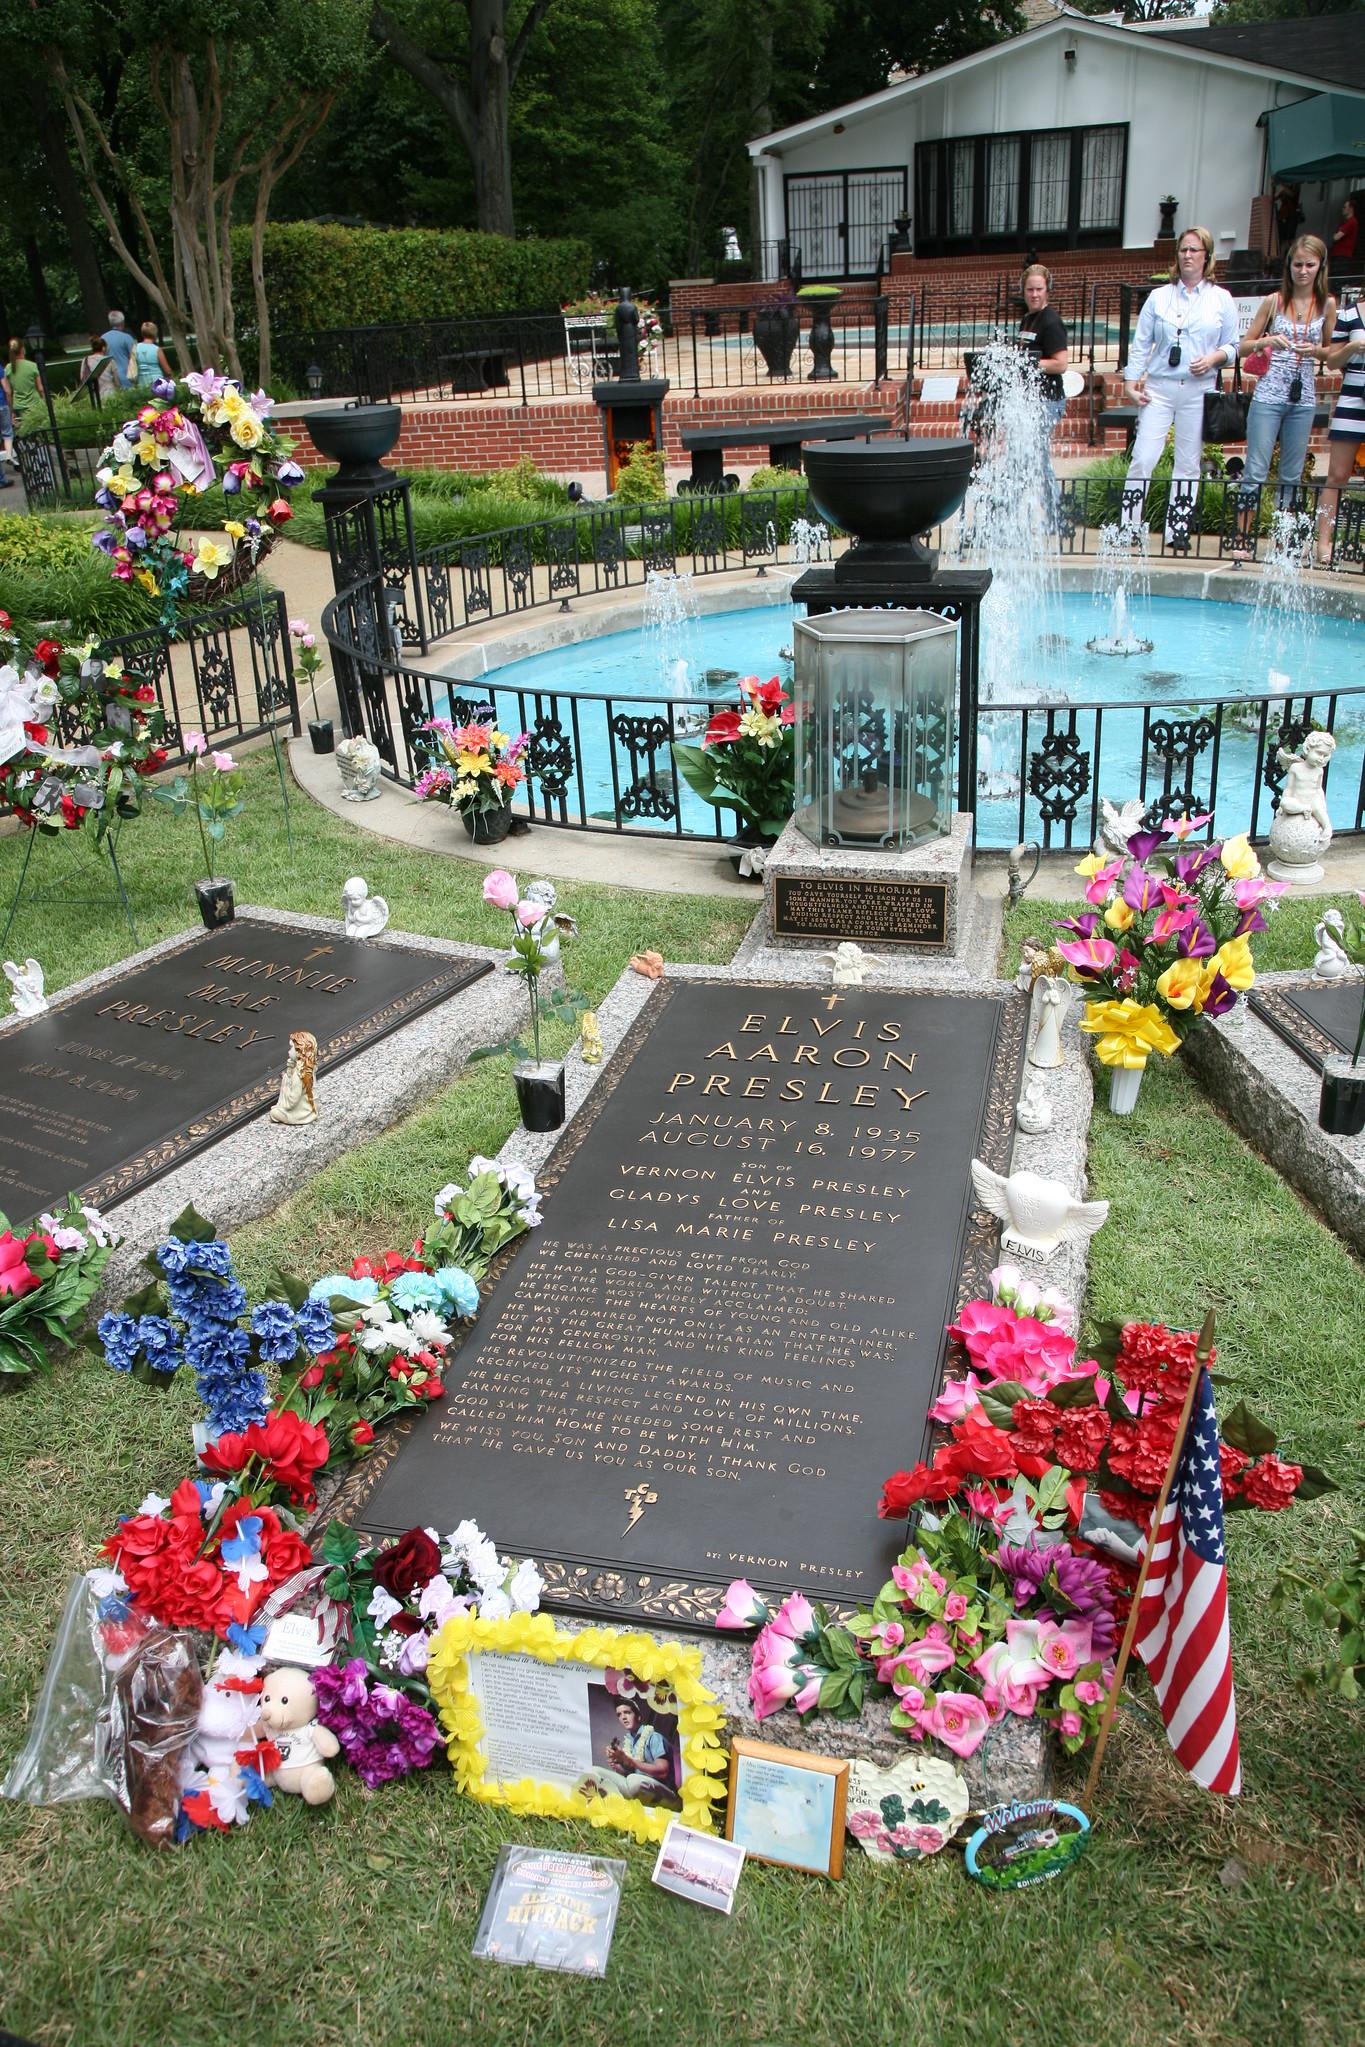 Elvis Presley's gravestone at Graceland, Memphis, Tennessee. Photo taken on June 13, 2009.